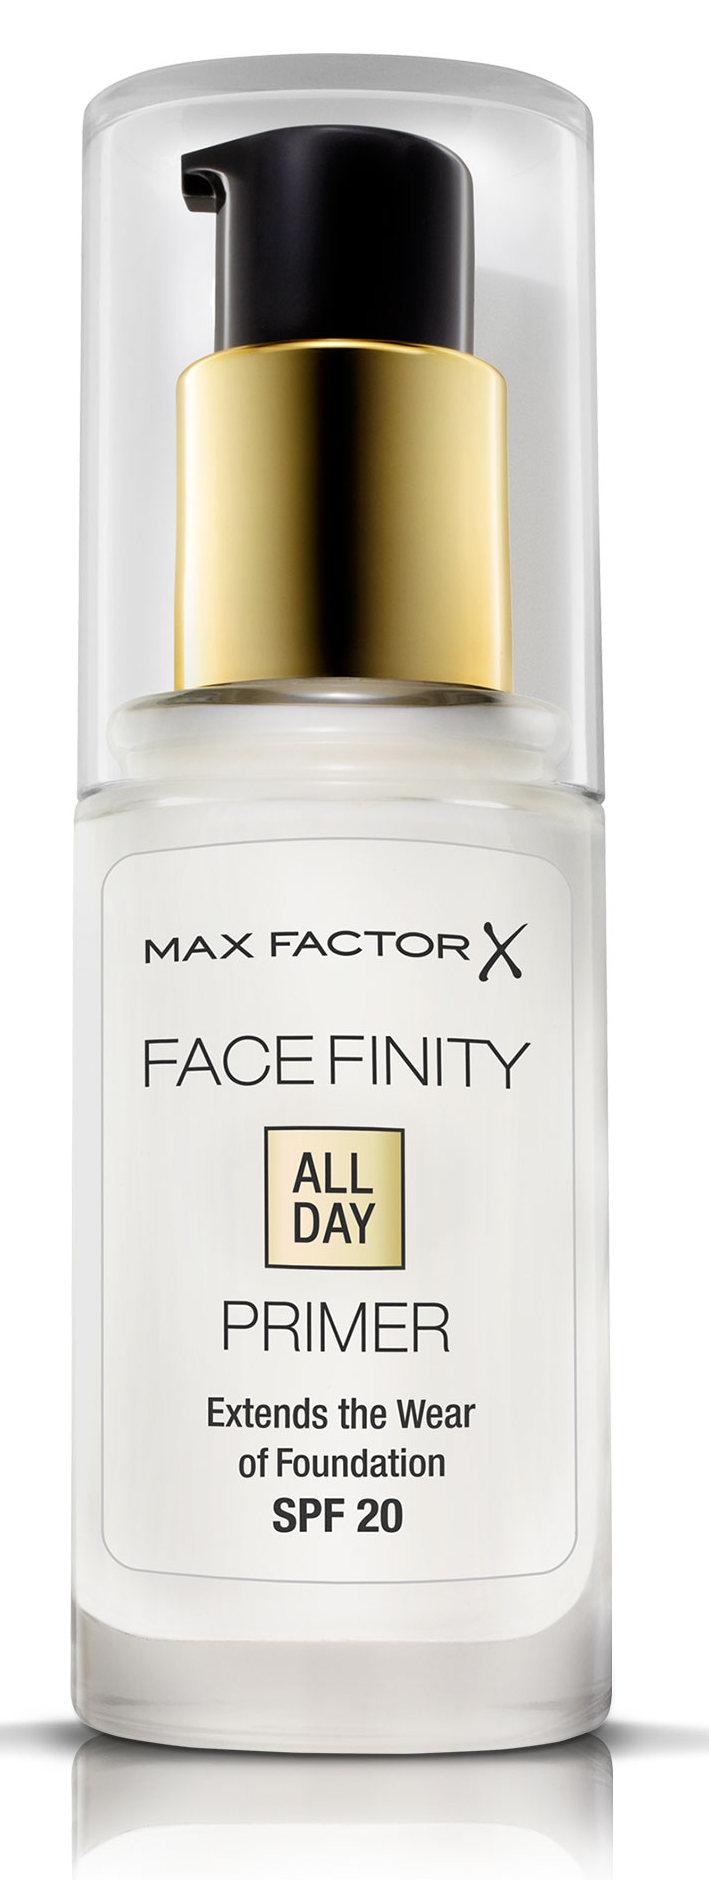 MAX FACTOR Праймер прозрачный для лица / Facefinity All Day Primer - Особые средства